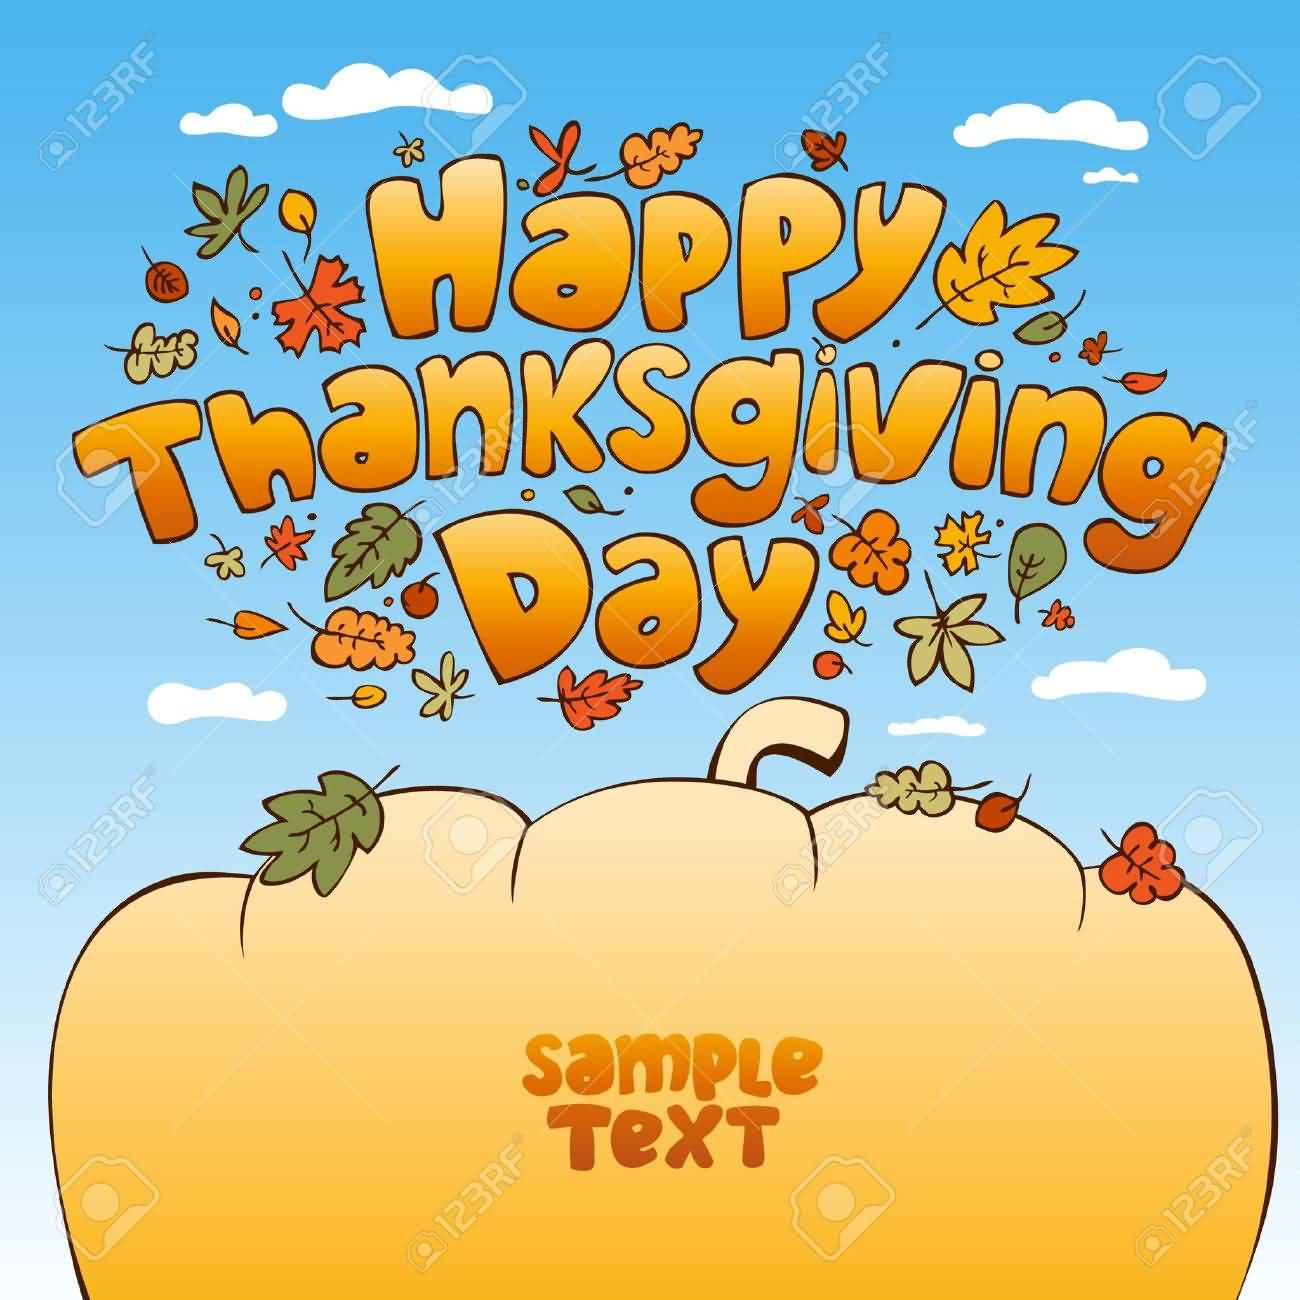 Happy Thanksgiving Day 2016 Illustration